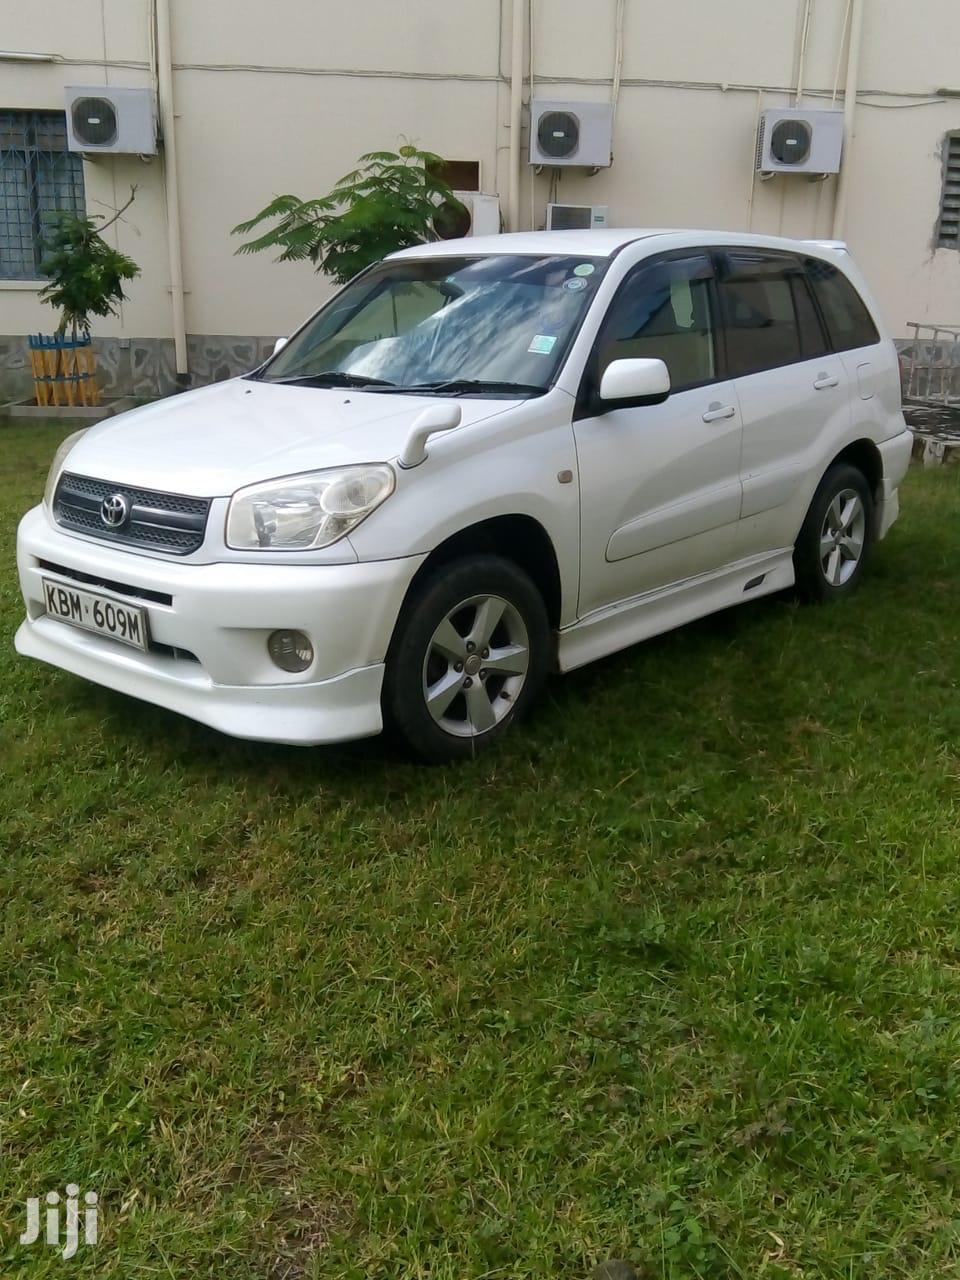 Toyota RAV4 200 4X4 Automatic 2008 White | Cars for sale in Tudor, Mombasa, Kenya